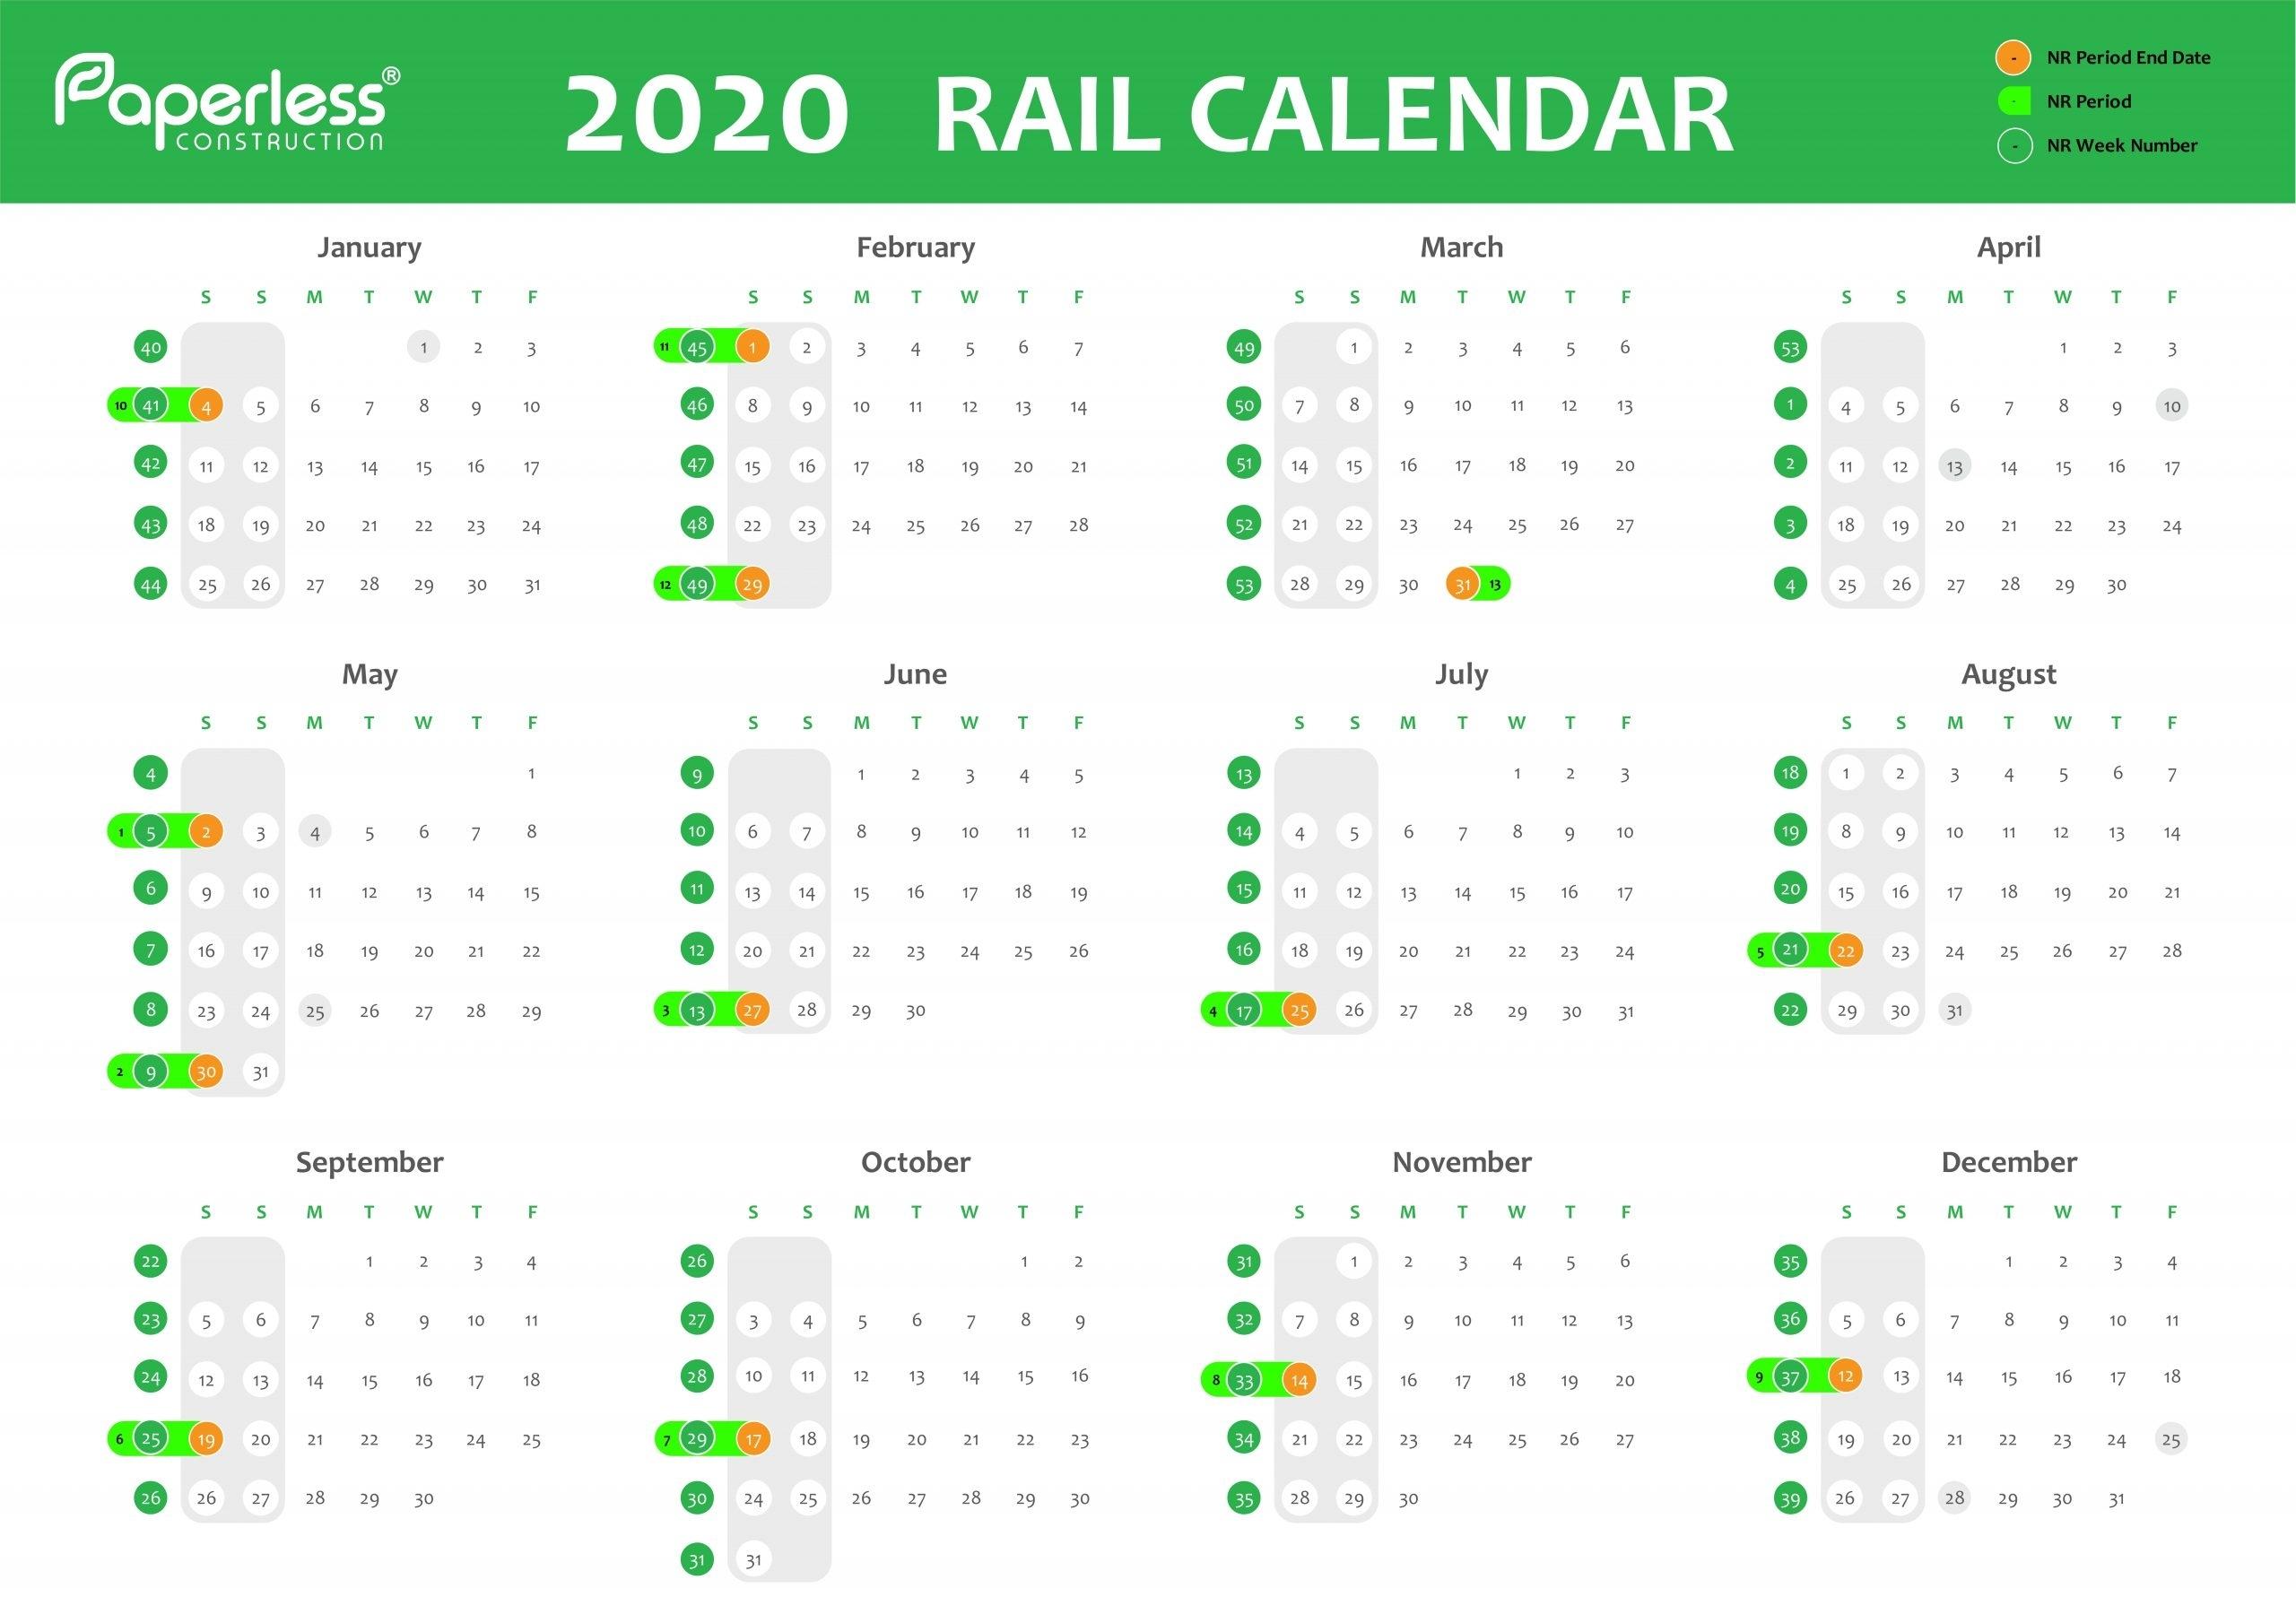 Collect Networkrail Week Numbers